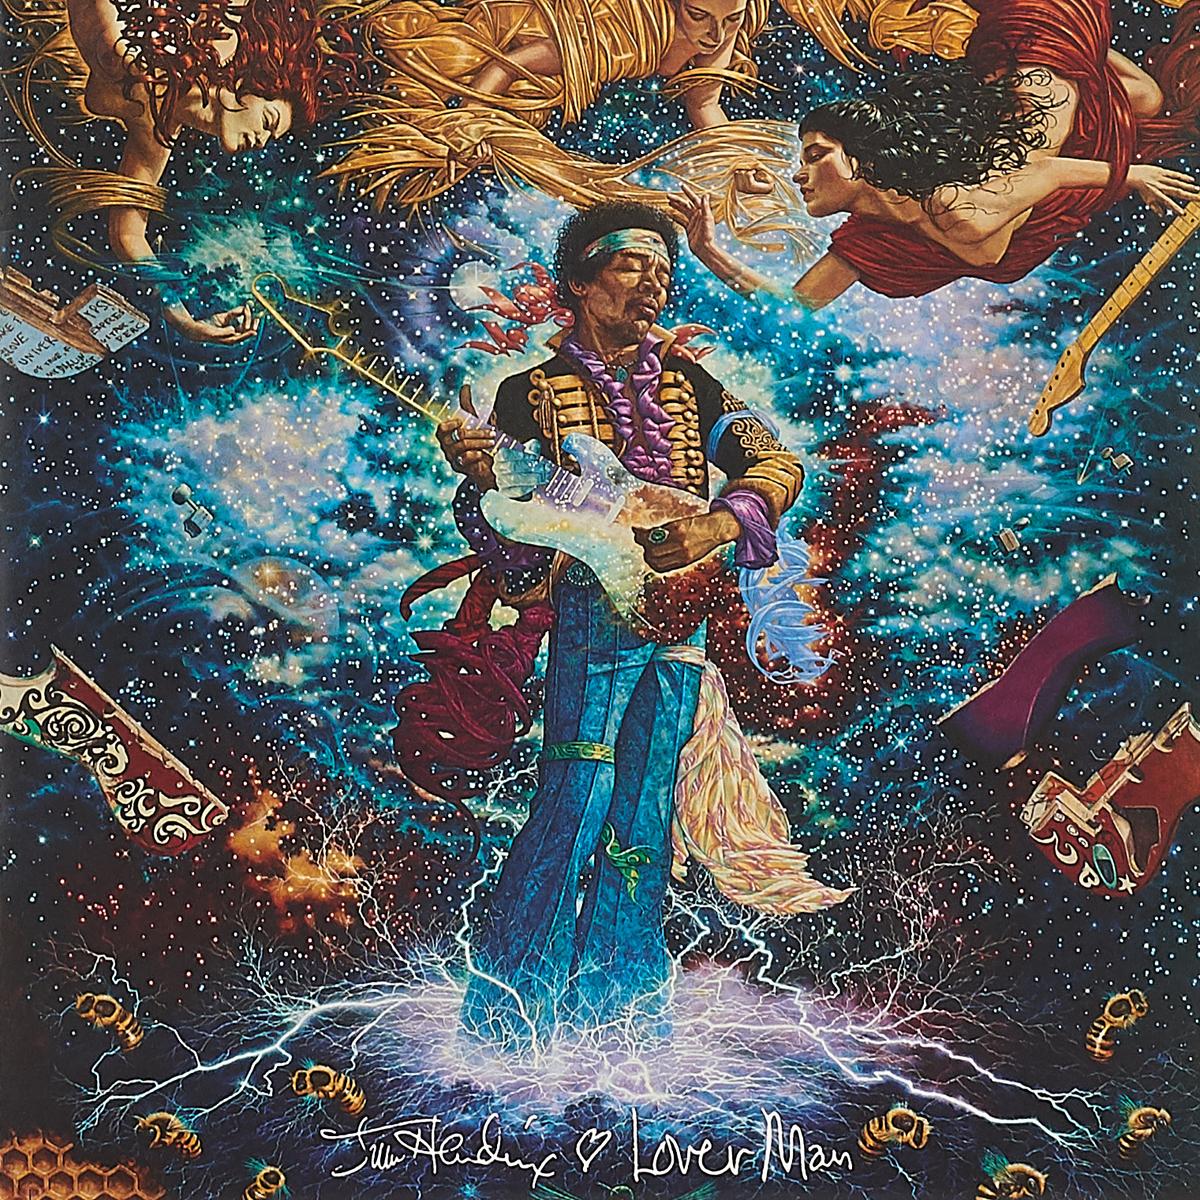 Джими Хендрикс Jimi Hendrix. Lover Man, Foxy Lady (LP) d h lawrence lady chatterleys lover